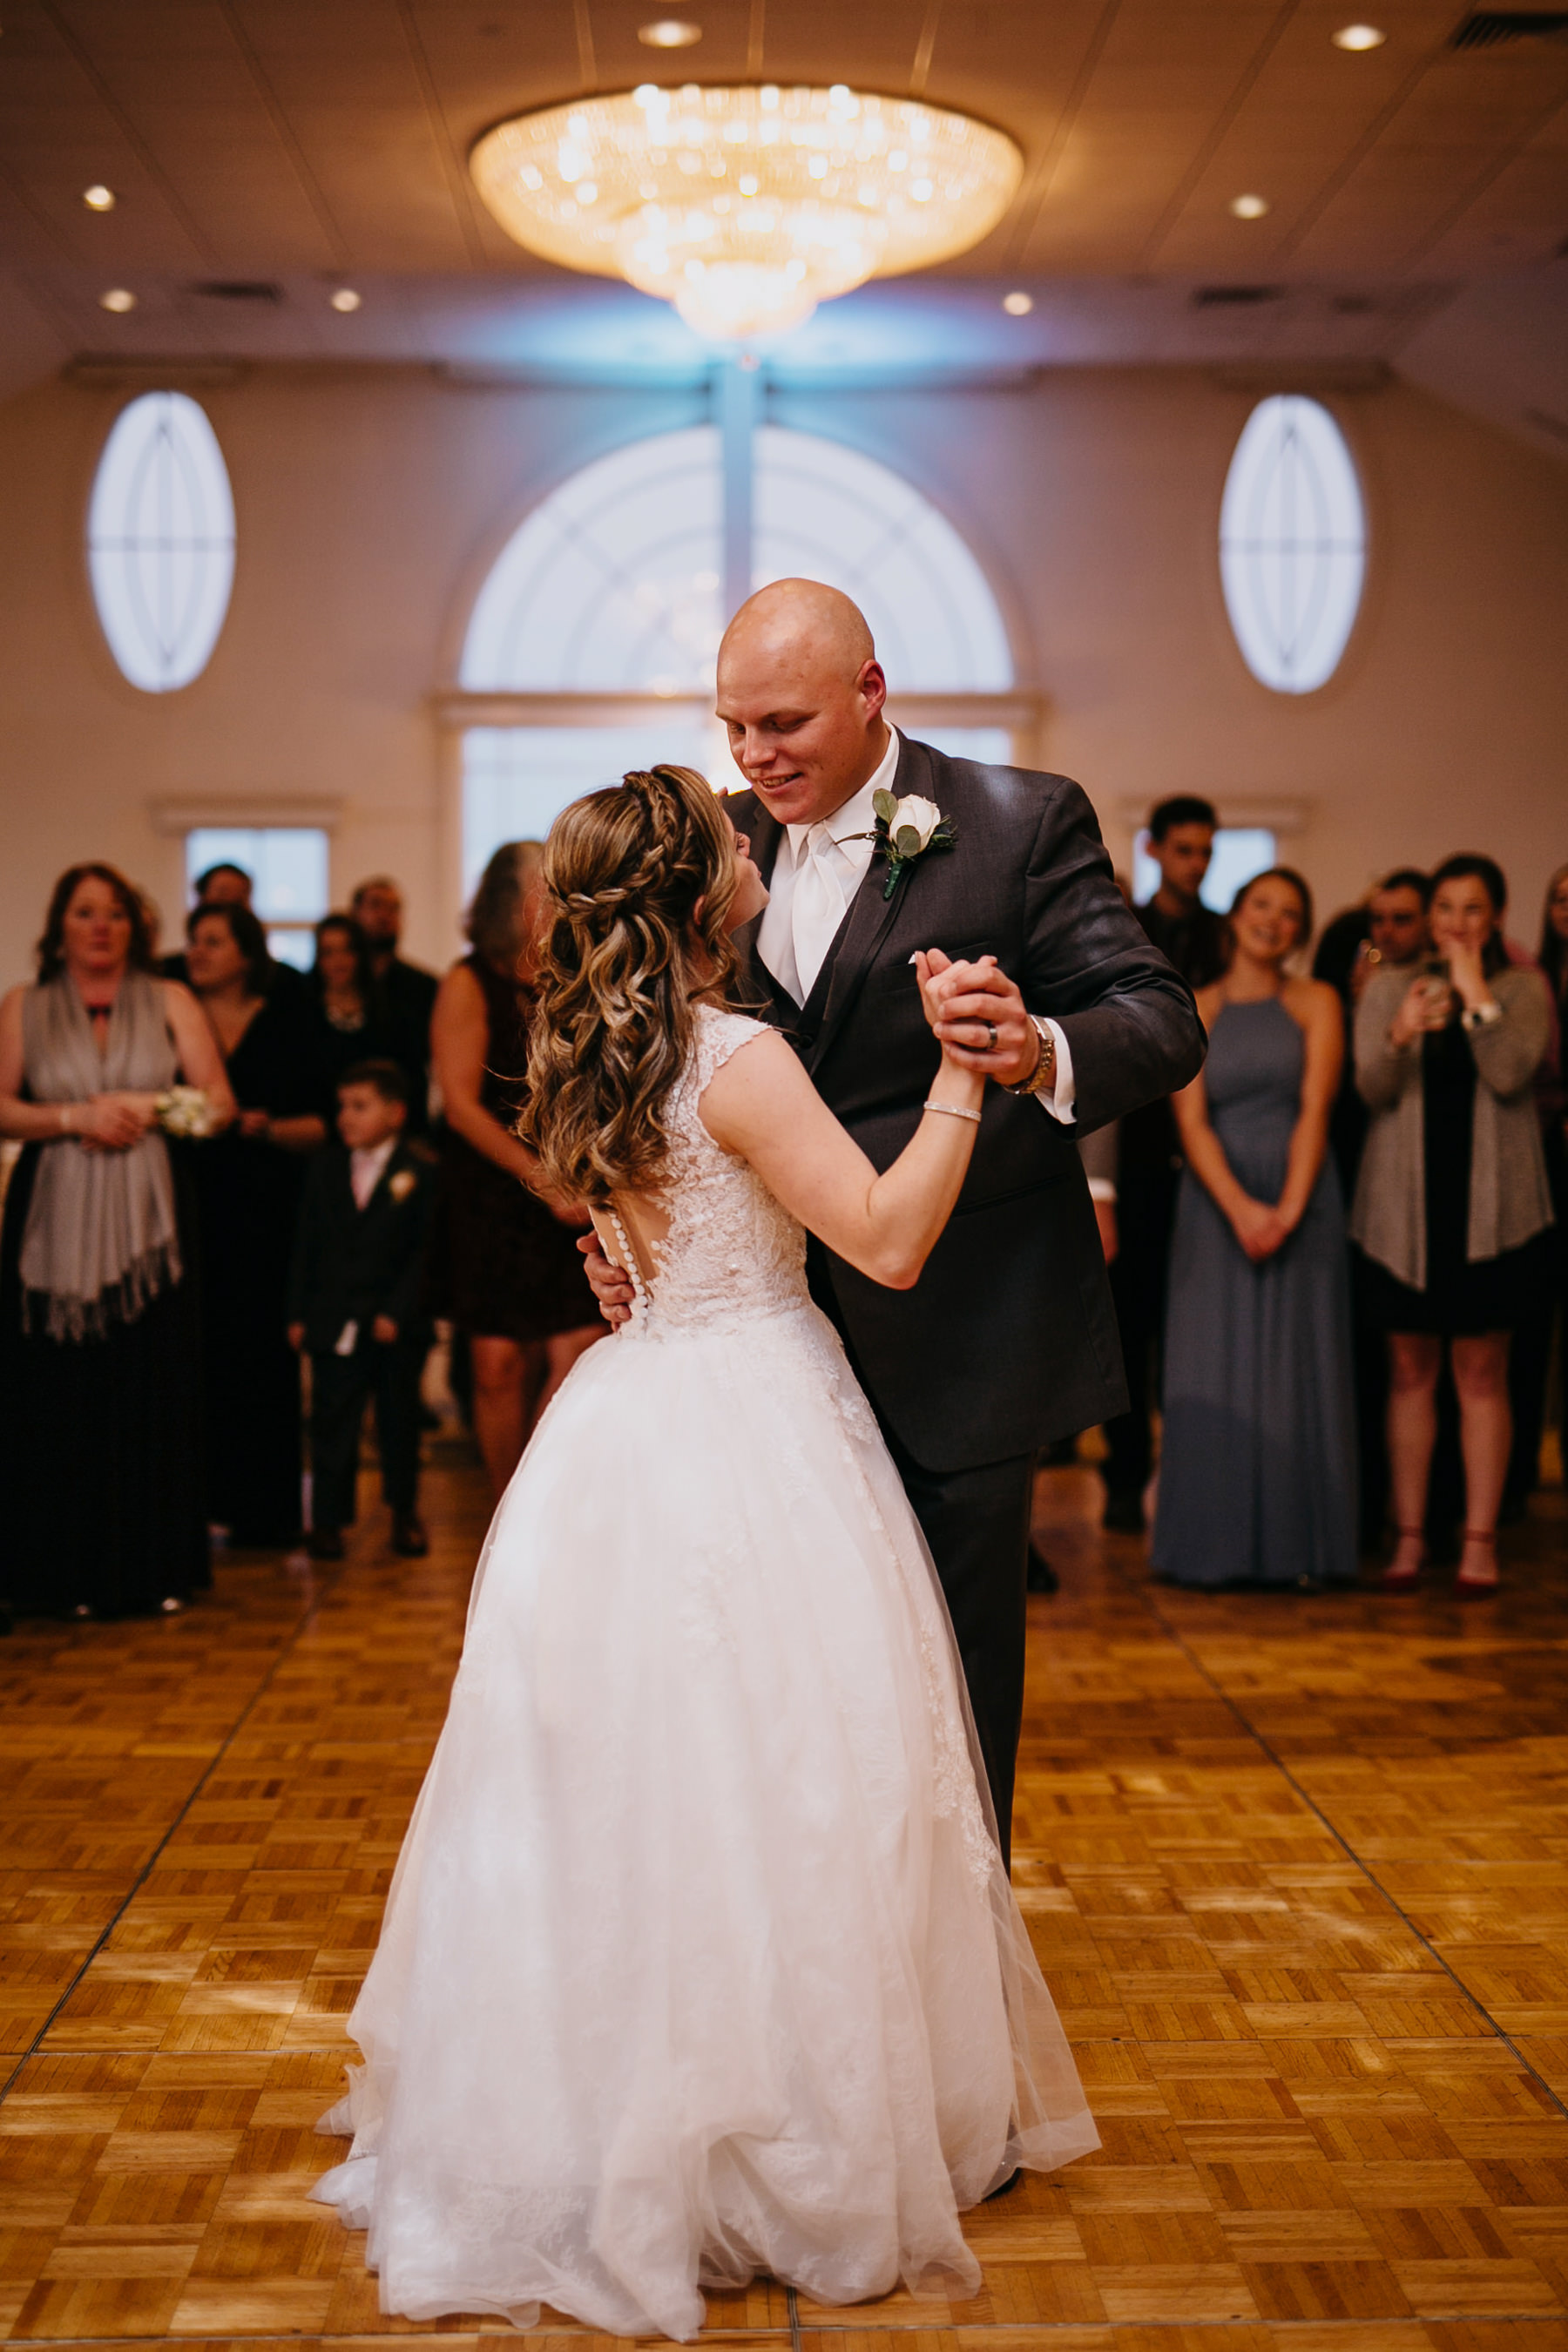 Quincy Ma Massachusetts Wedding Dedham Boston Granie Links Wedding New England Catholic Cathedral Liz Osban Photography 88.jpg